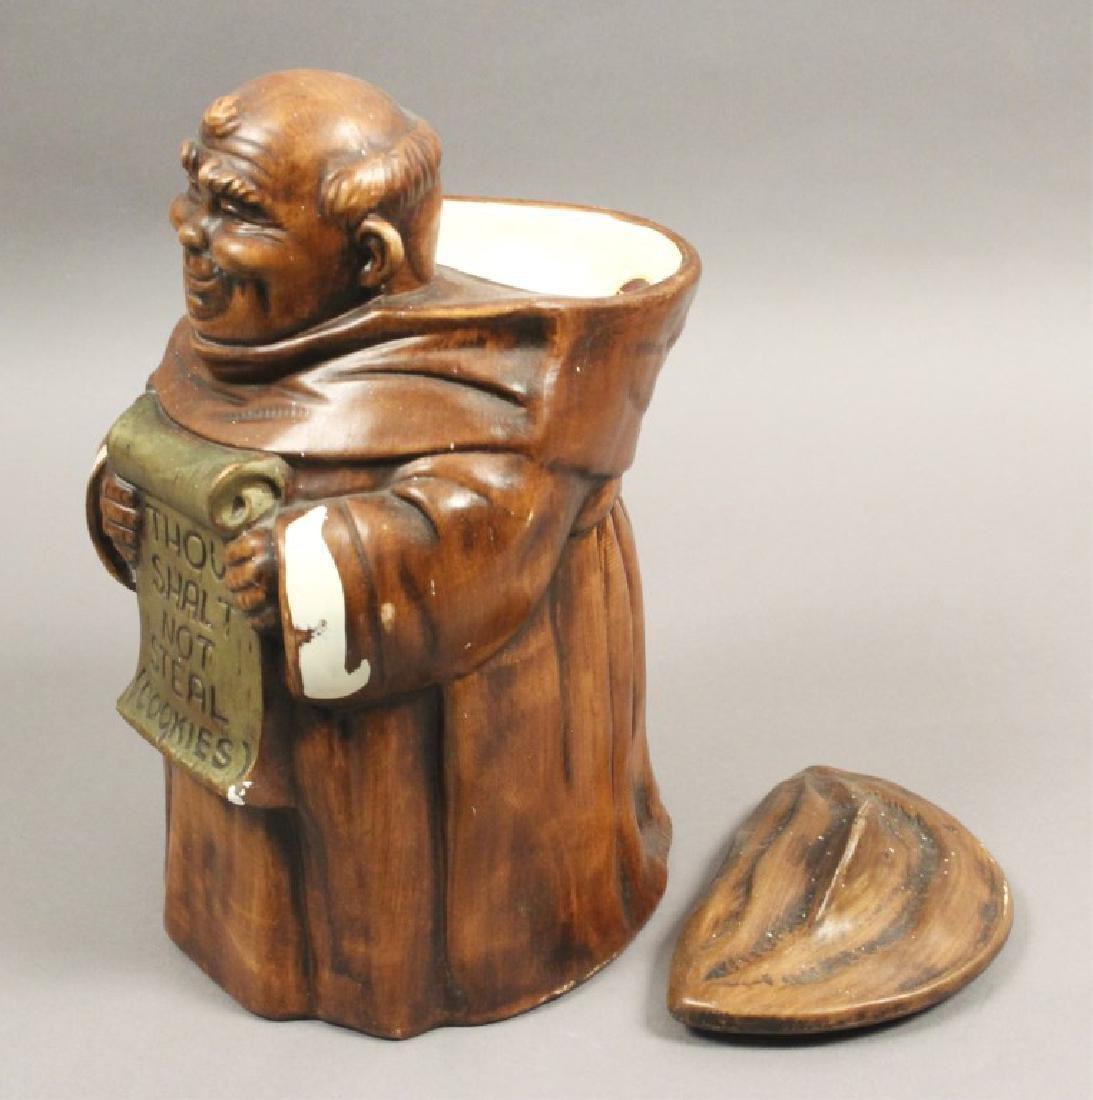 'Thou Shalt Not Steal' Friar Cookie Jar - 2